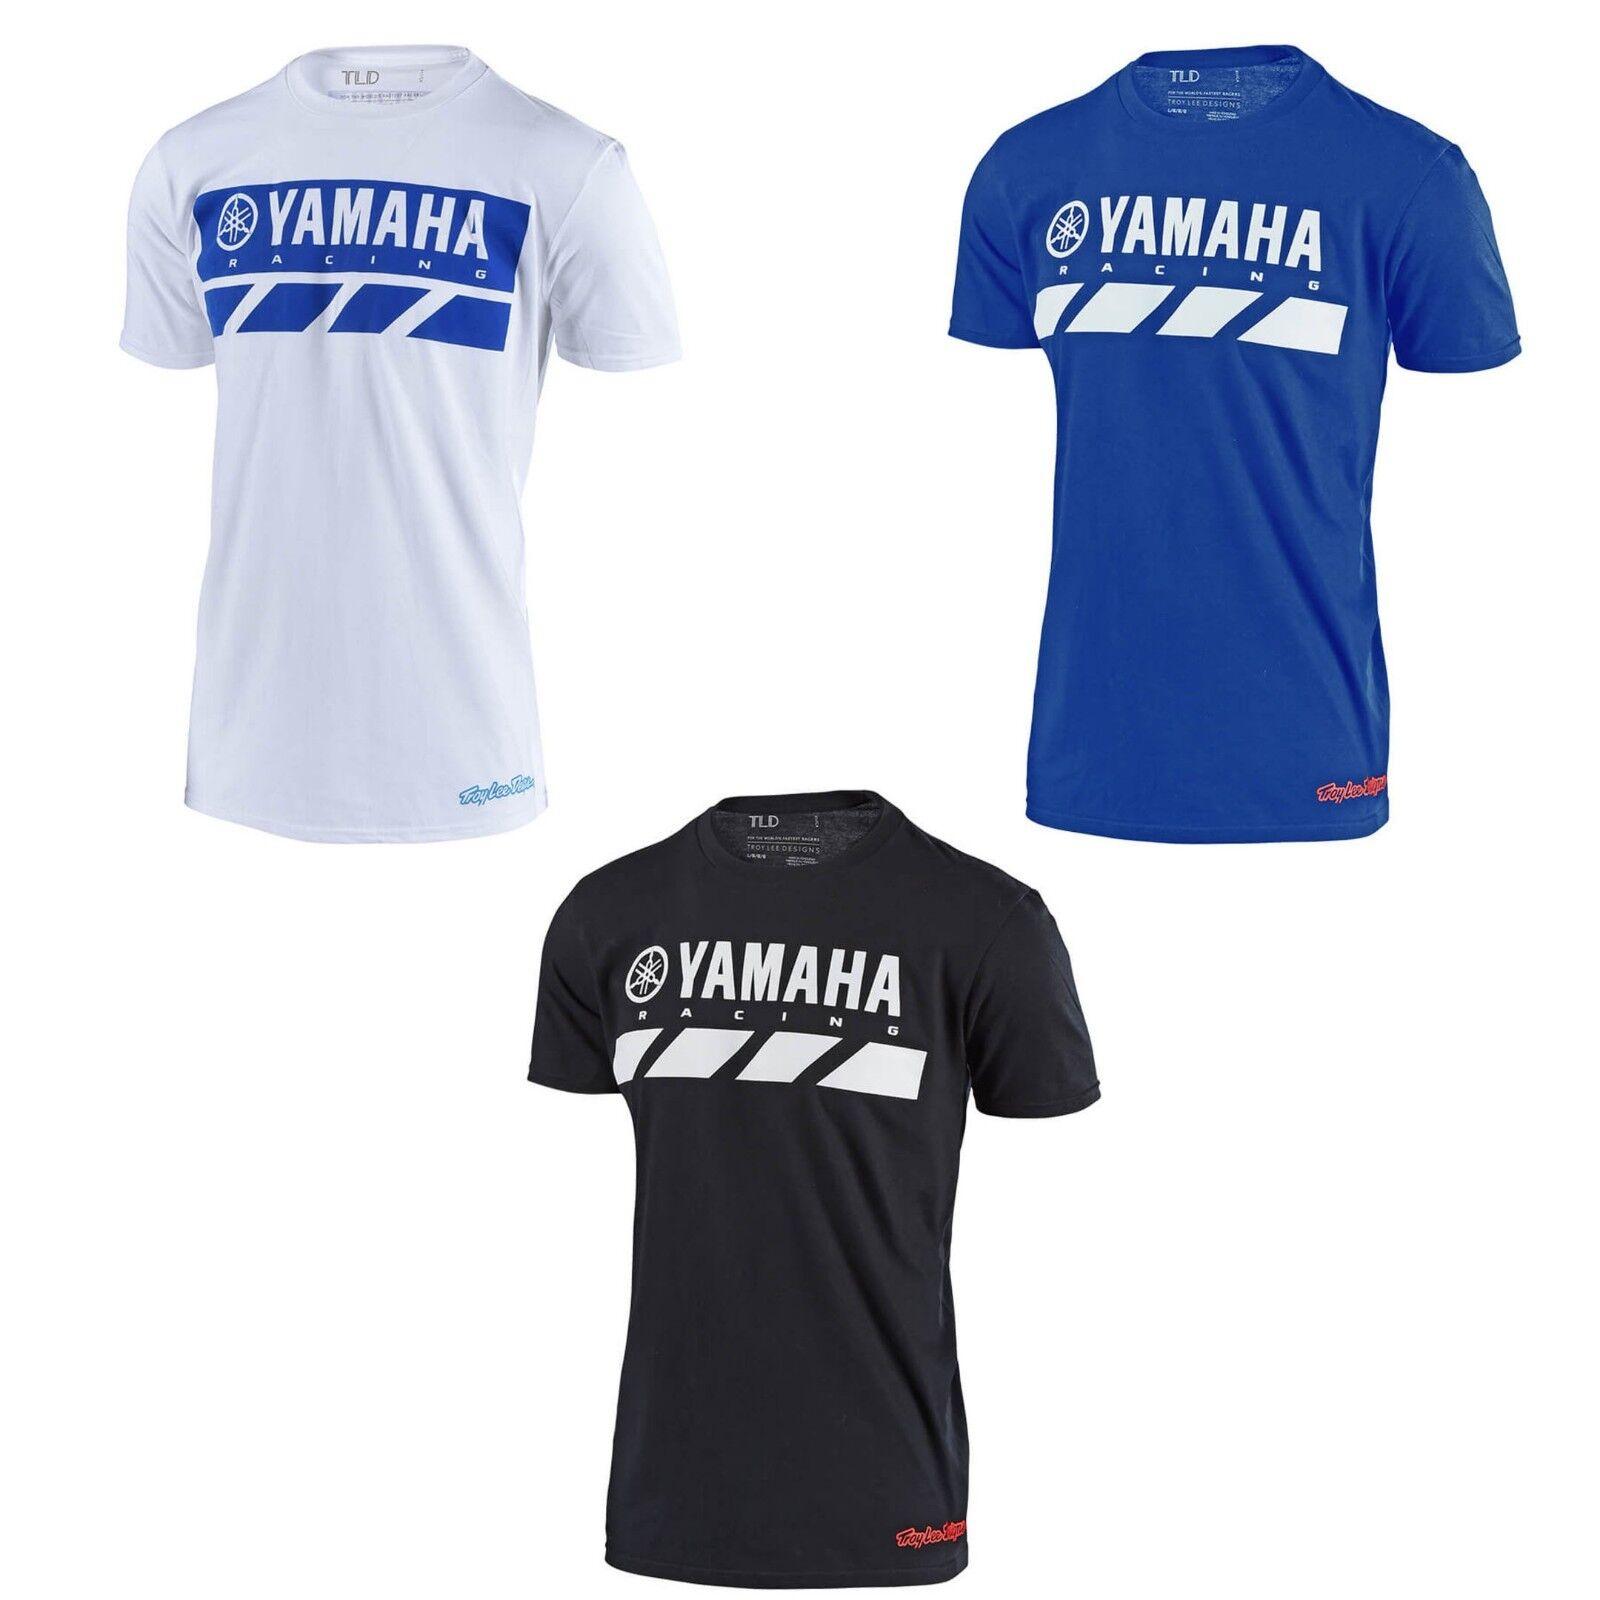 Troy Lee Designs Yamaha RS2 Mens Short Sleeve T-Shirt Blue